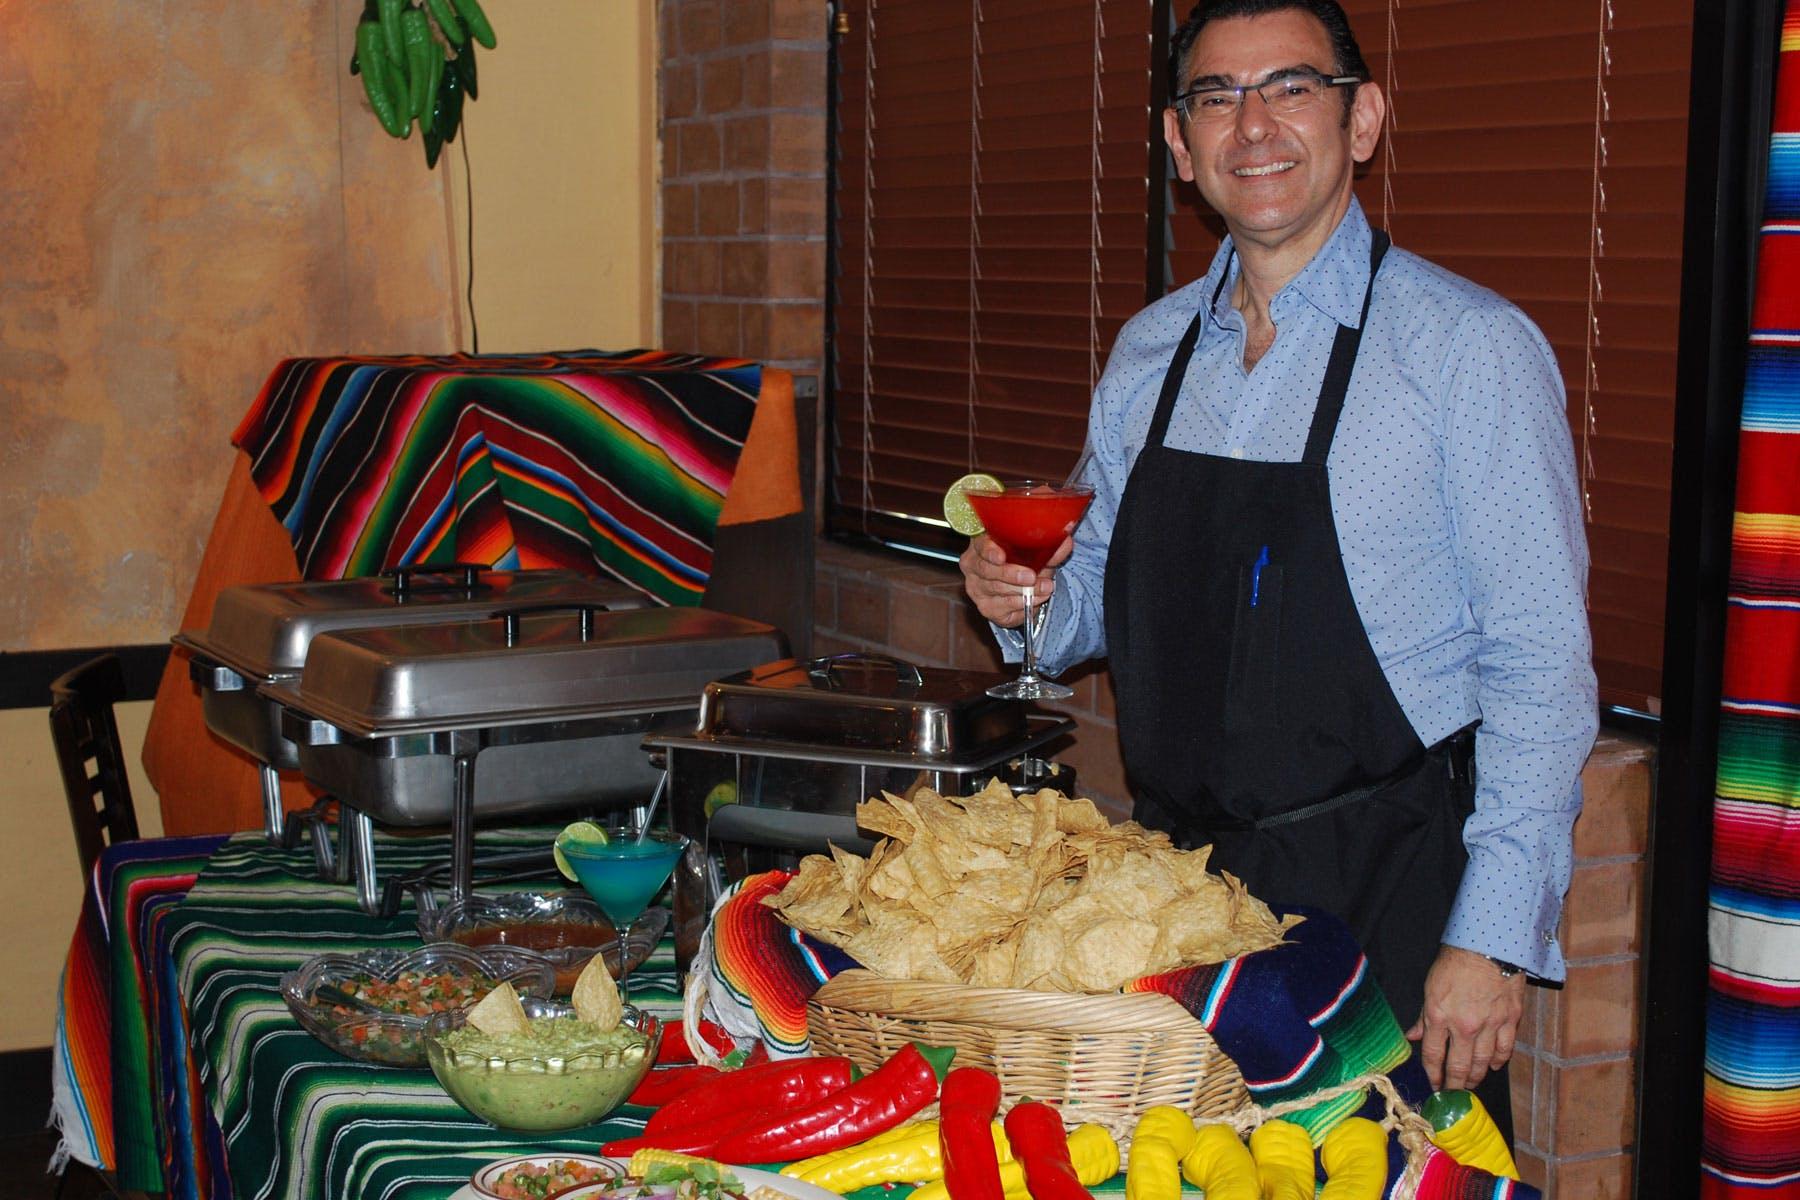 andres-novoa-owner-la-cocina-mexican-restaurant-catering-richmond-tx